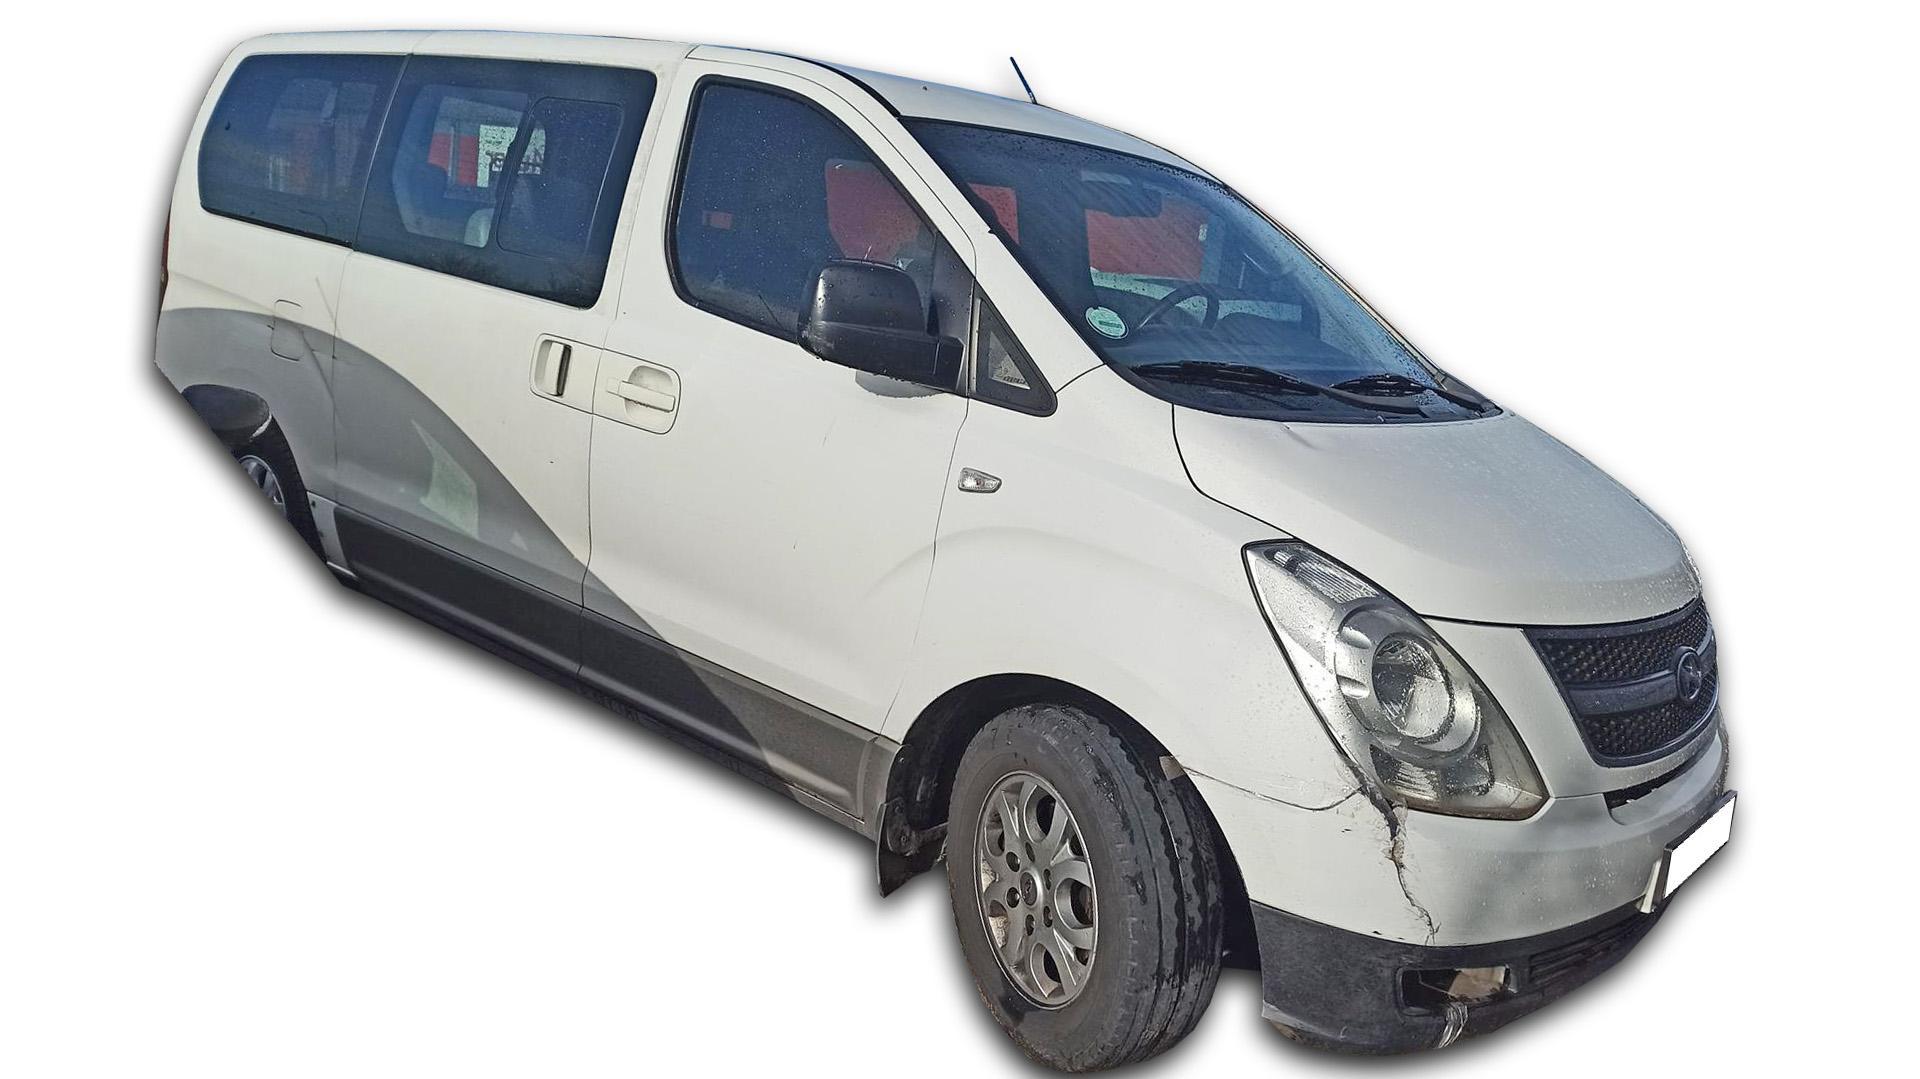 Hyundai H100 2.5 CRD (VGT) Wago